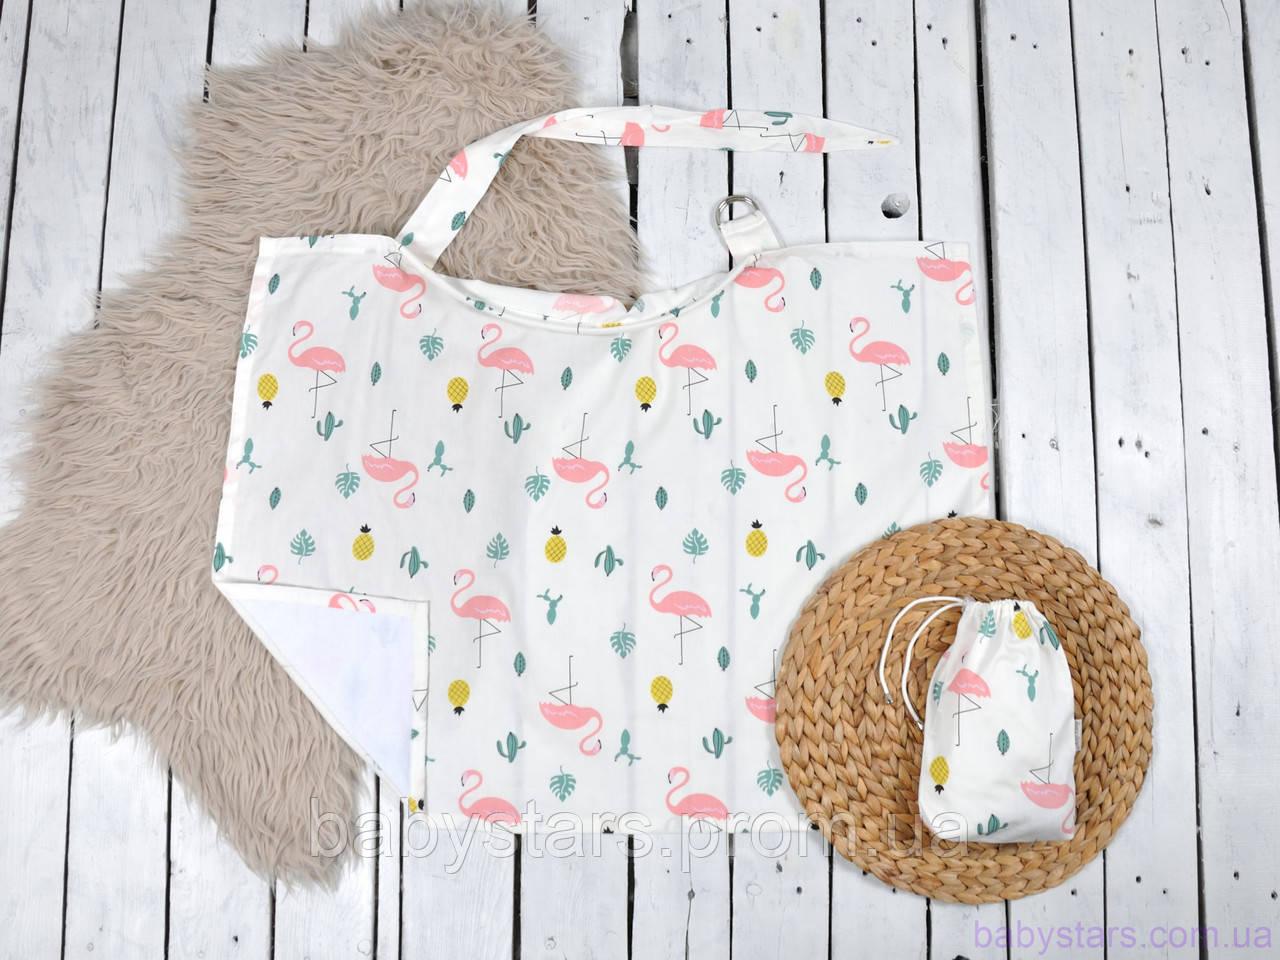 Накидка для кормления ребенка + сумочка-чехол, Кактусы и фламинго